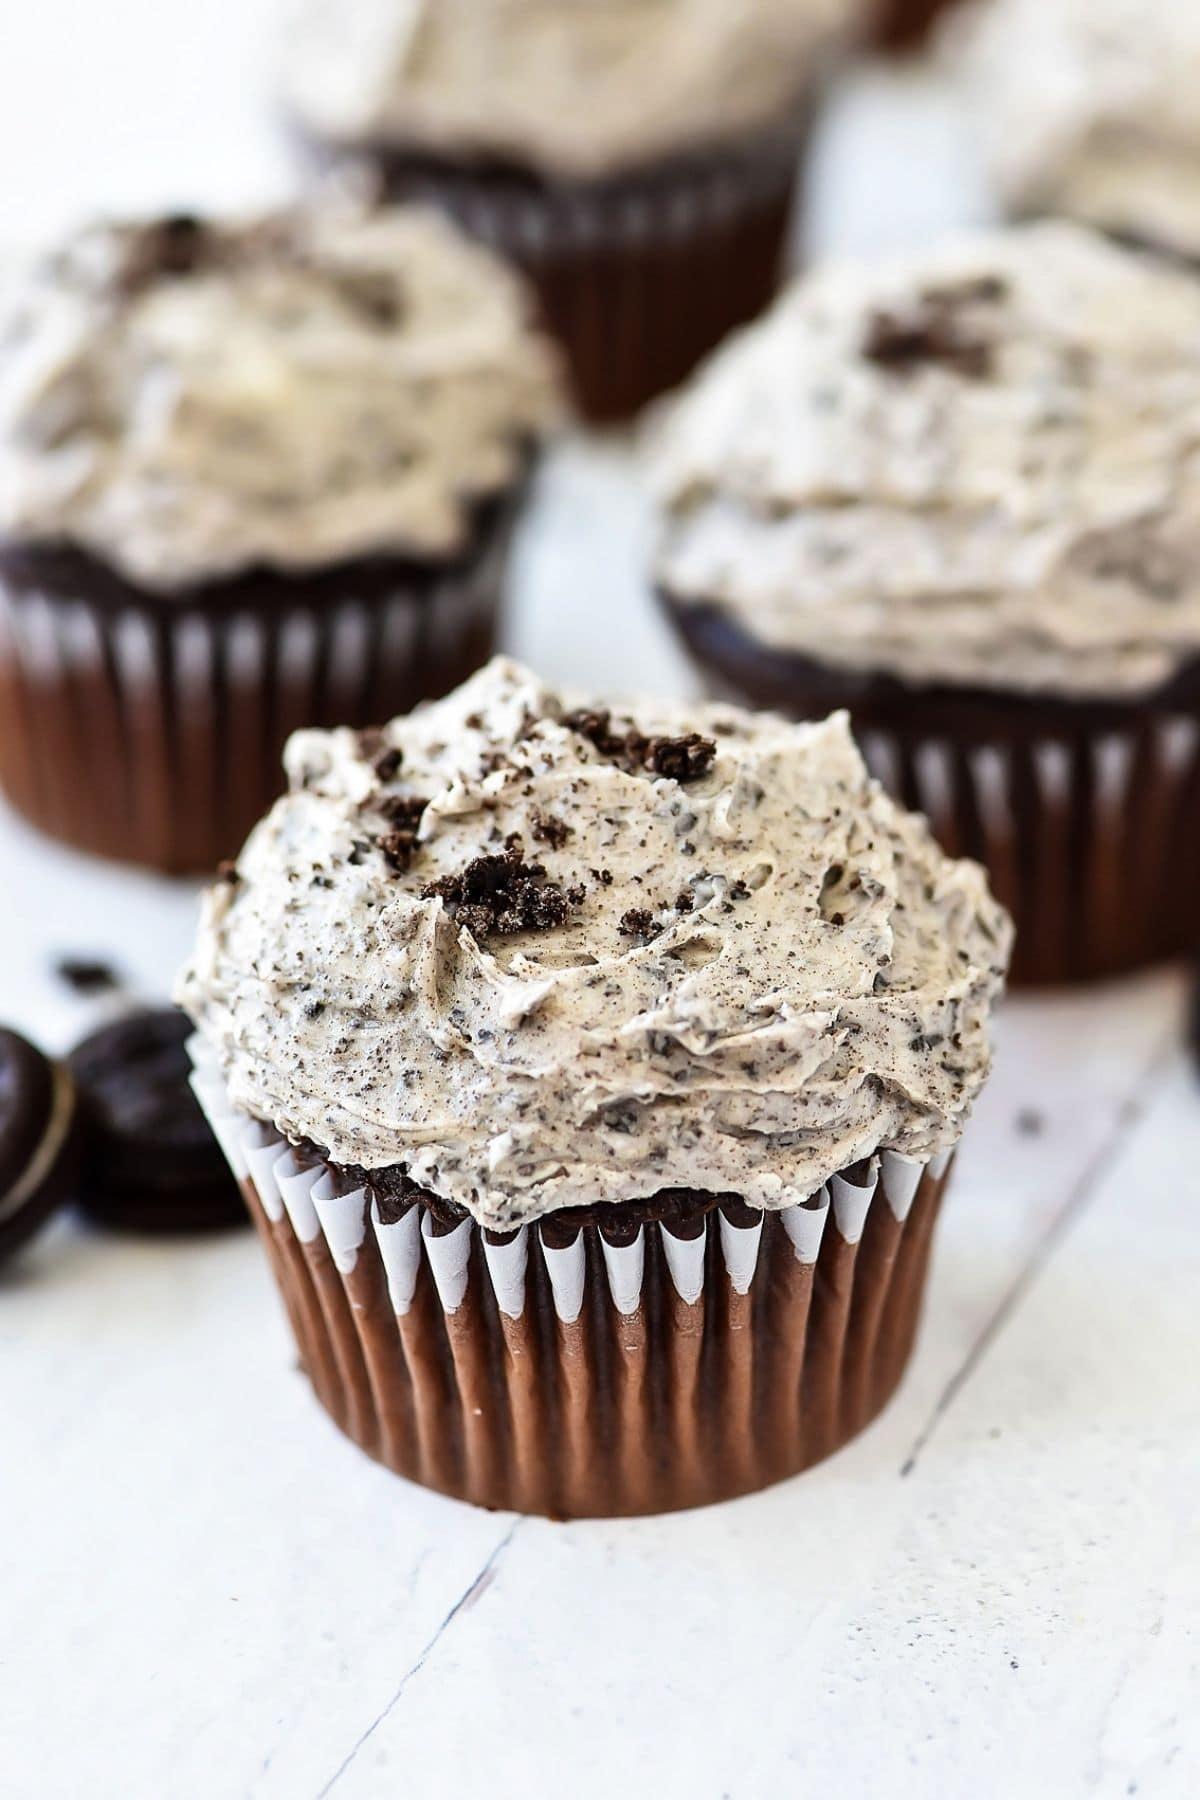 Cupcake with oreo icing